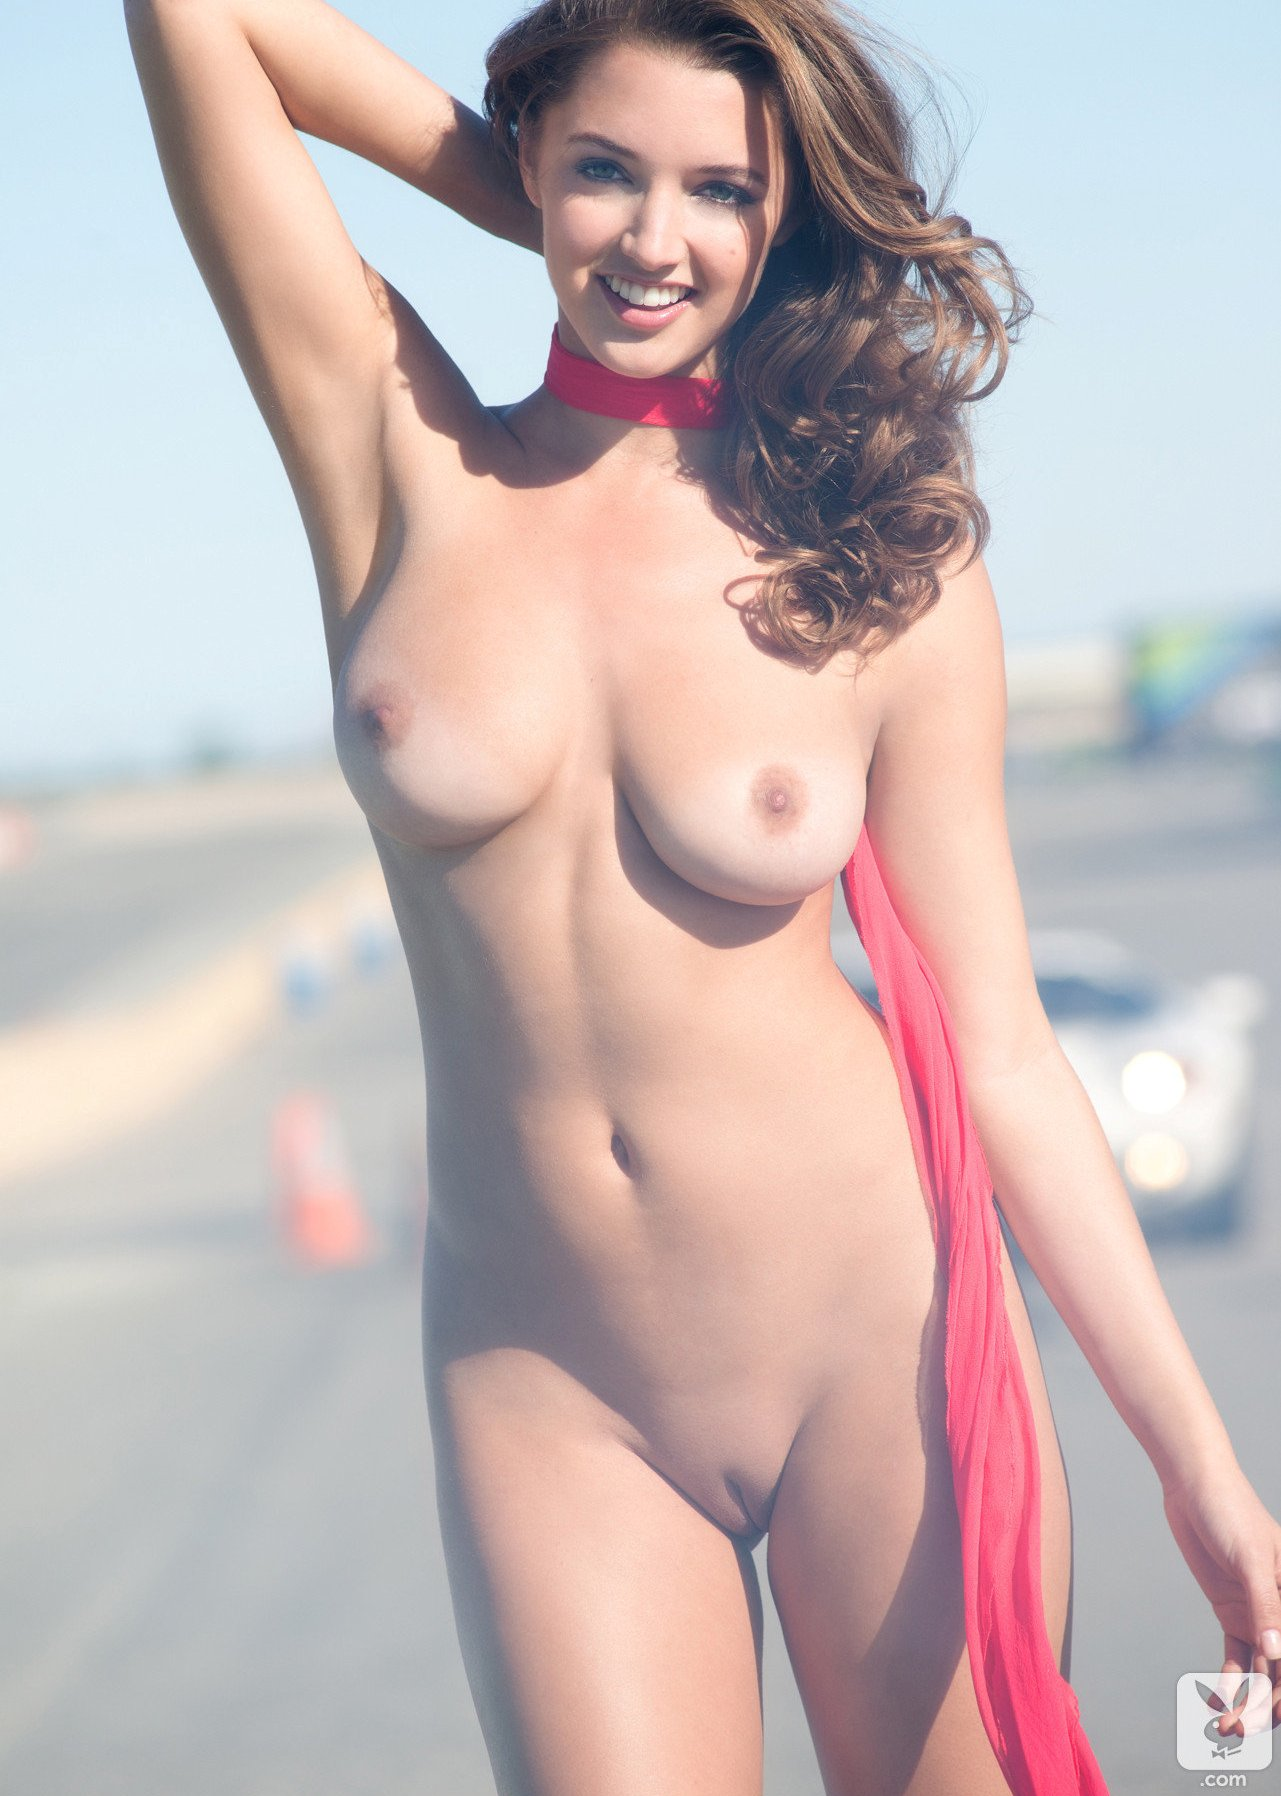 Alyssa Arce Instagram Nude Leaks 0001